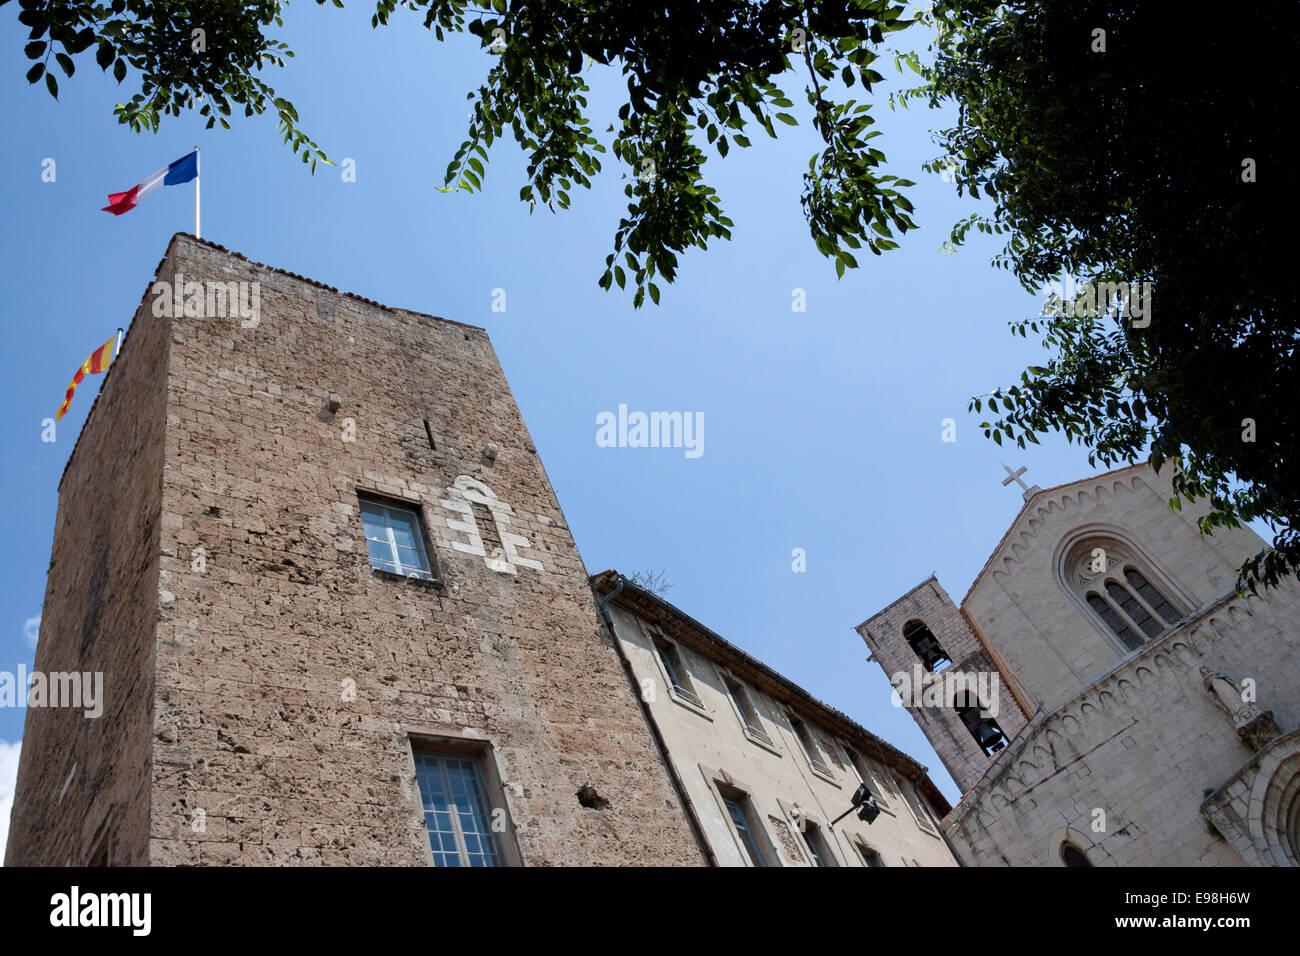 Buildings and bell tower of Cathédrale Notre-Dame-du-Puy. Grasse, Provence-Alpes-Côte d'Azur. France Stock Photo